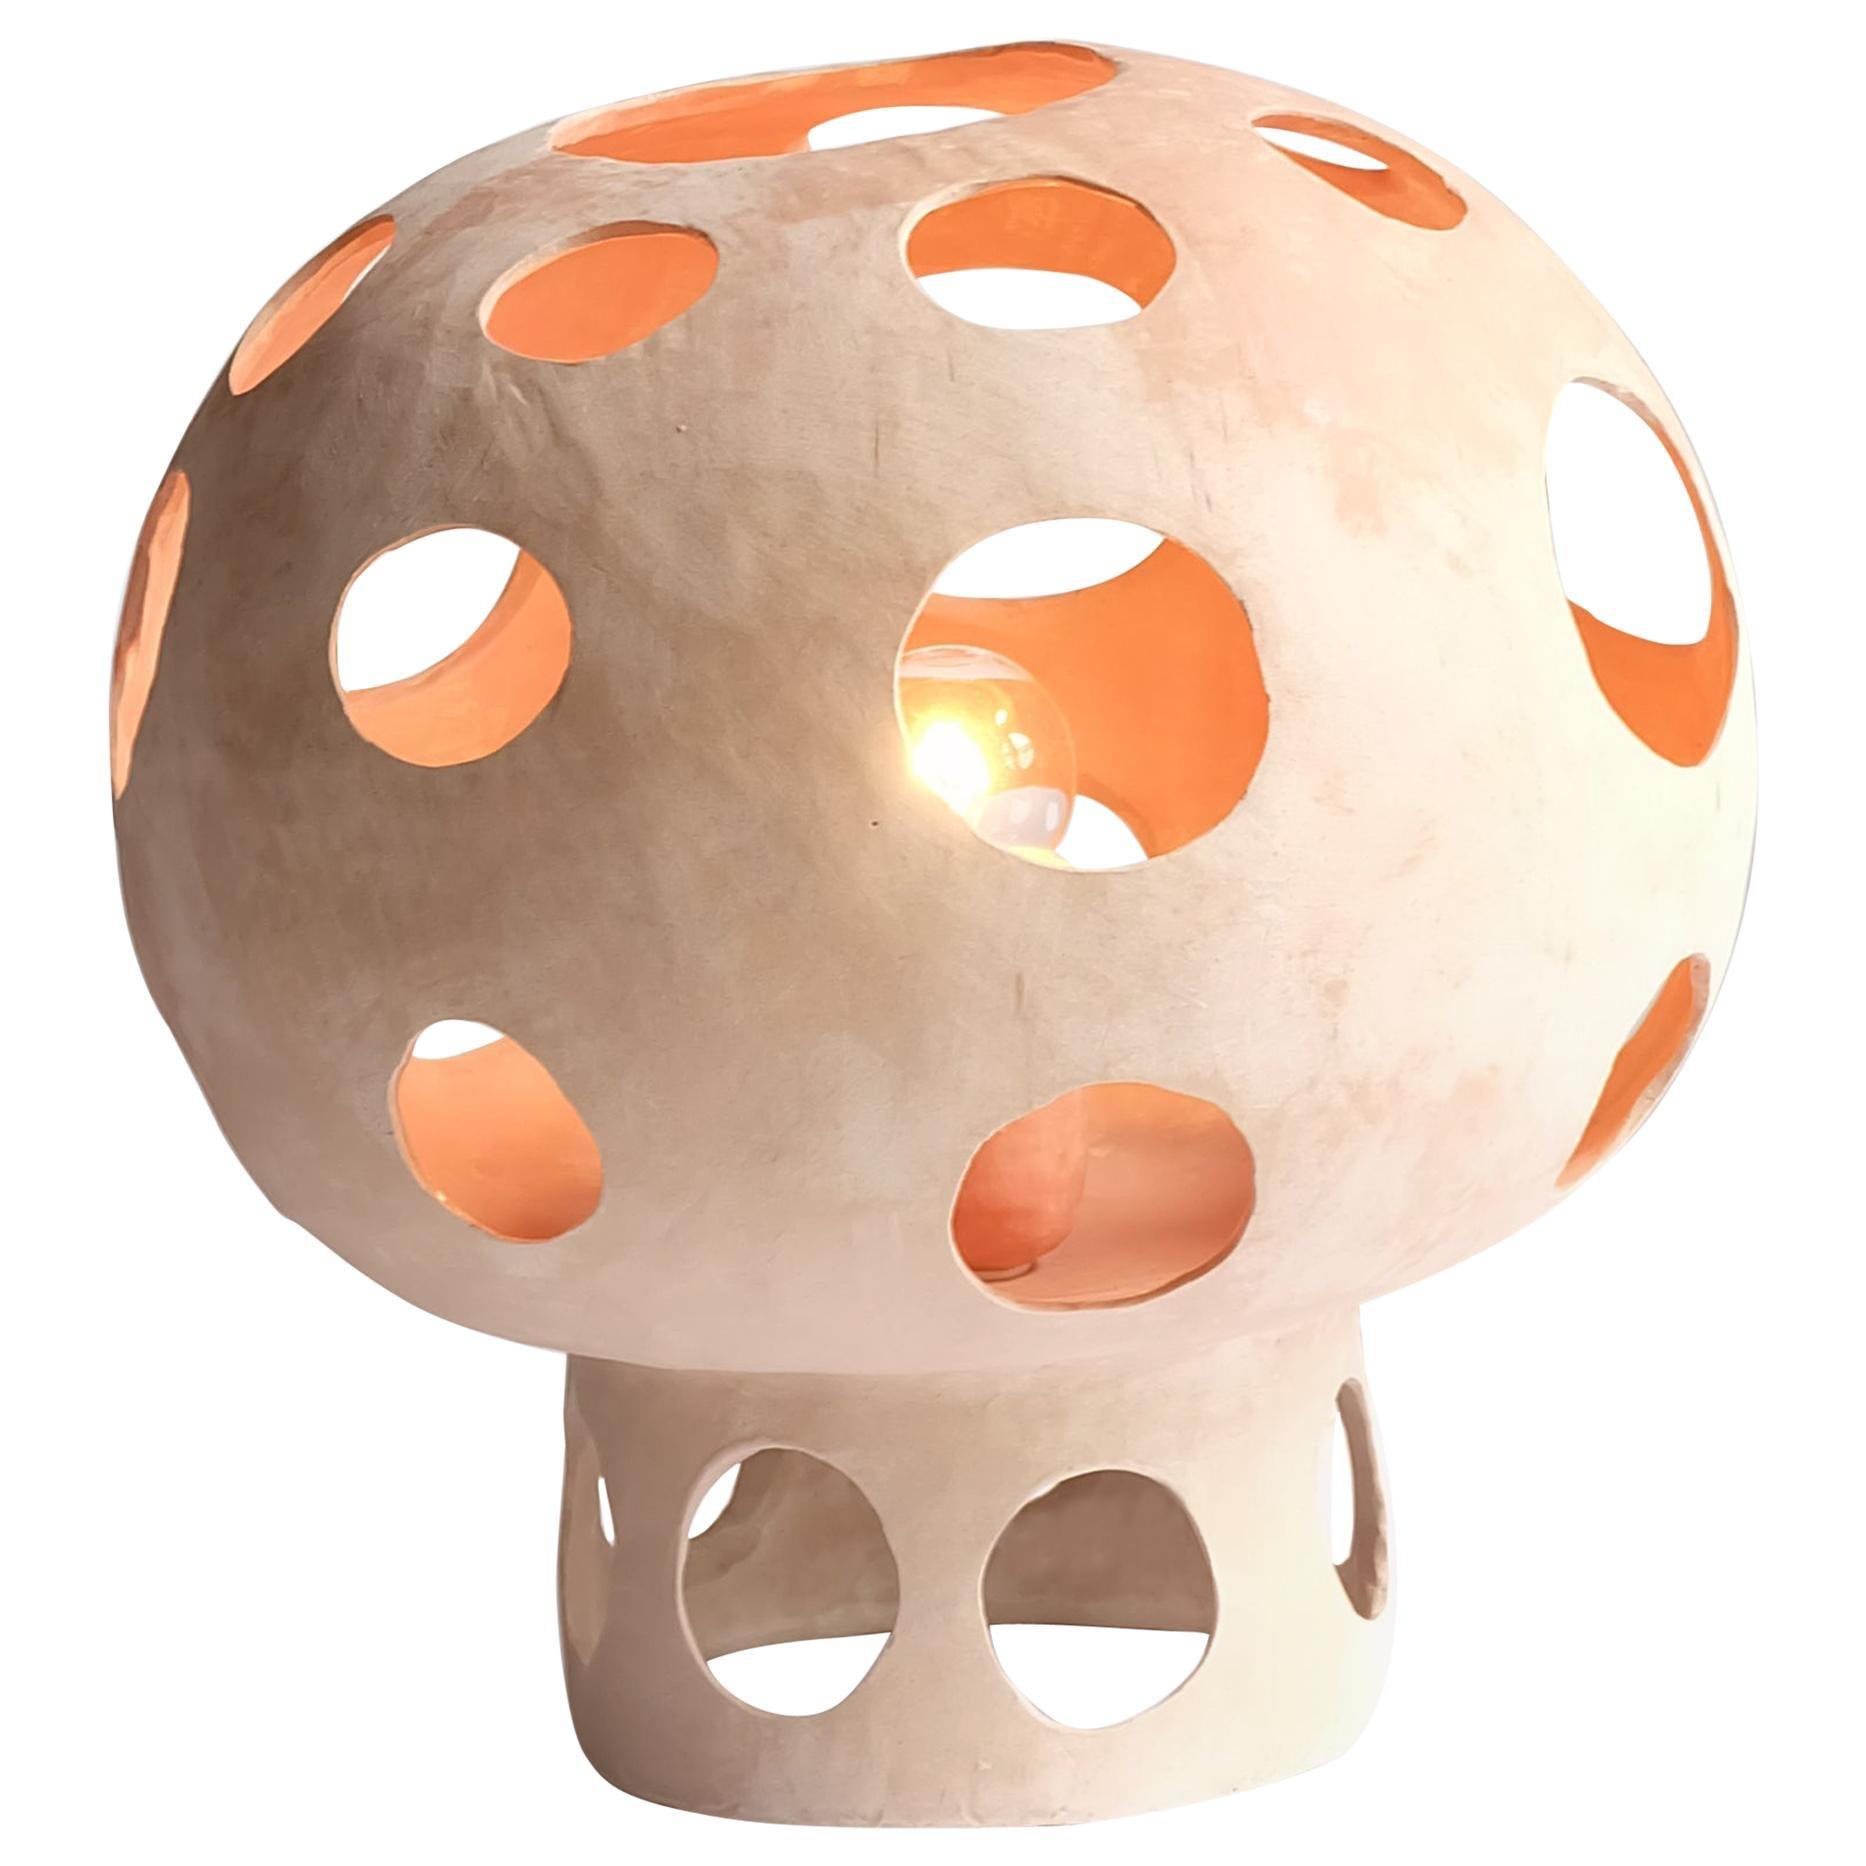 Contemporary Sculptural Hand-Built Ceramic Mushroom-Shaped Table Lamp